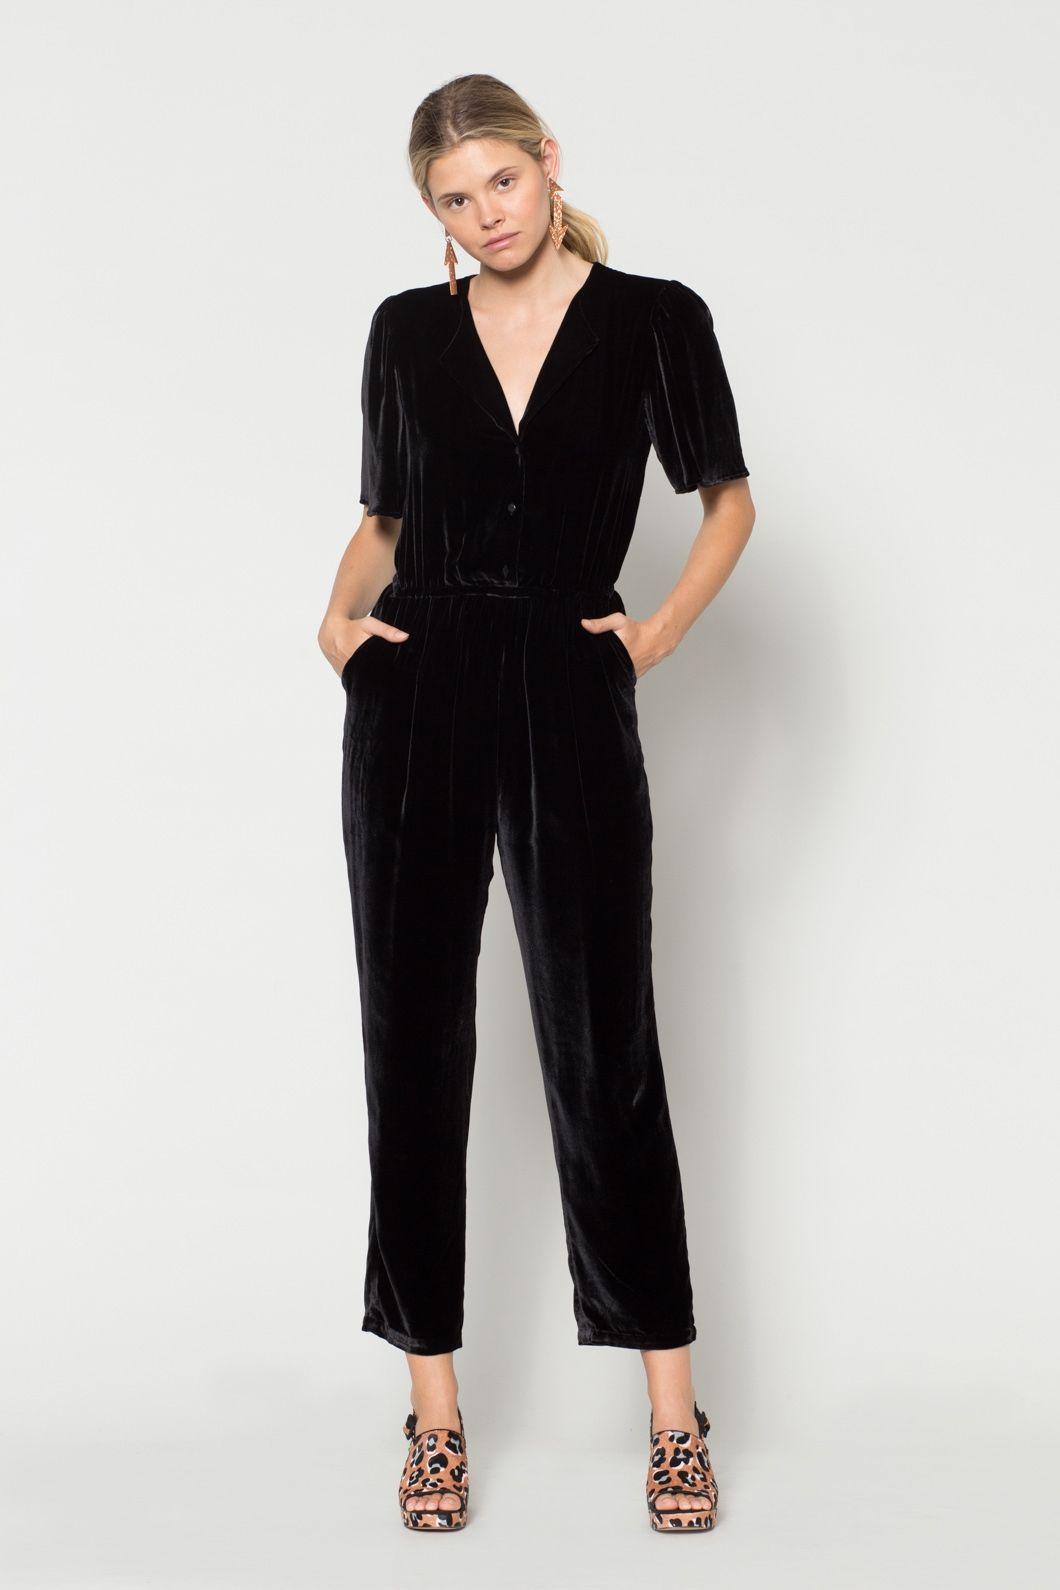 1a9d6a8e7be Gorman Online    Velvet Pantsuit - New Arrivals